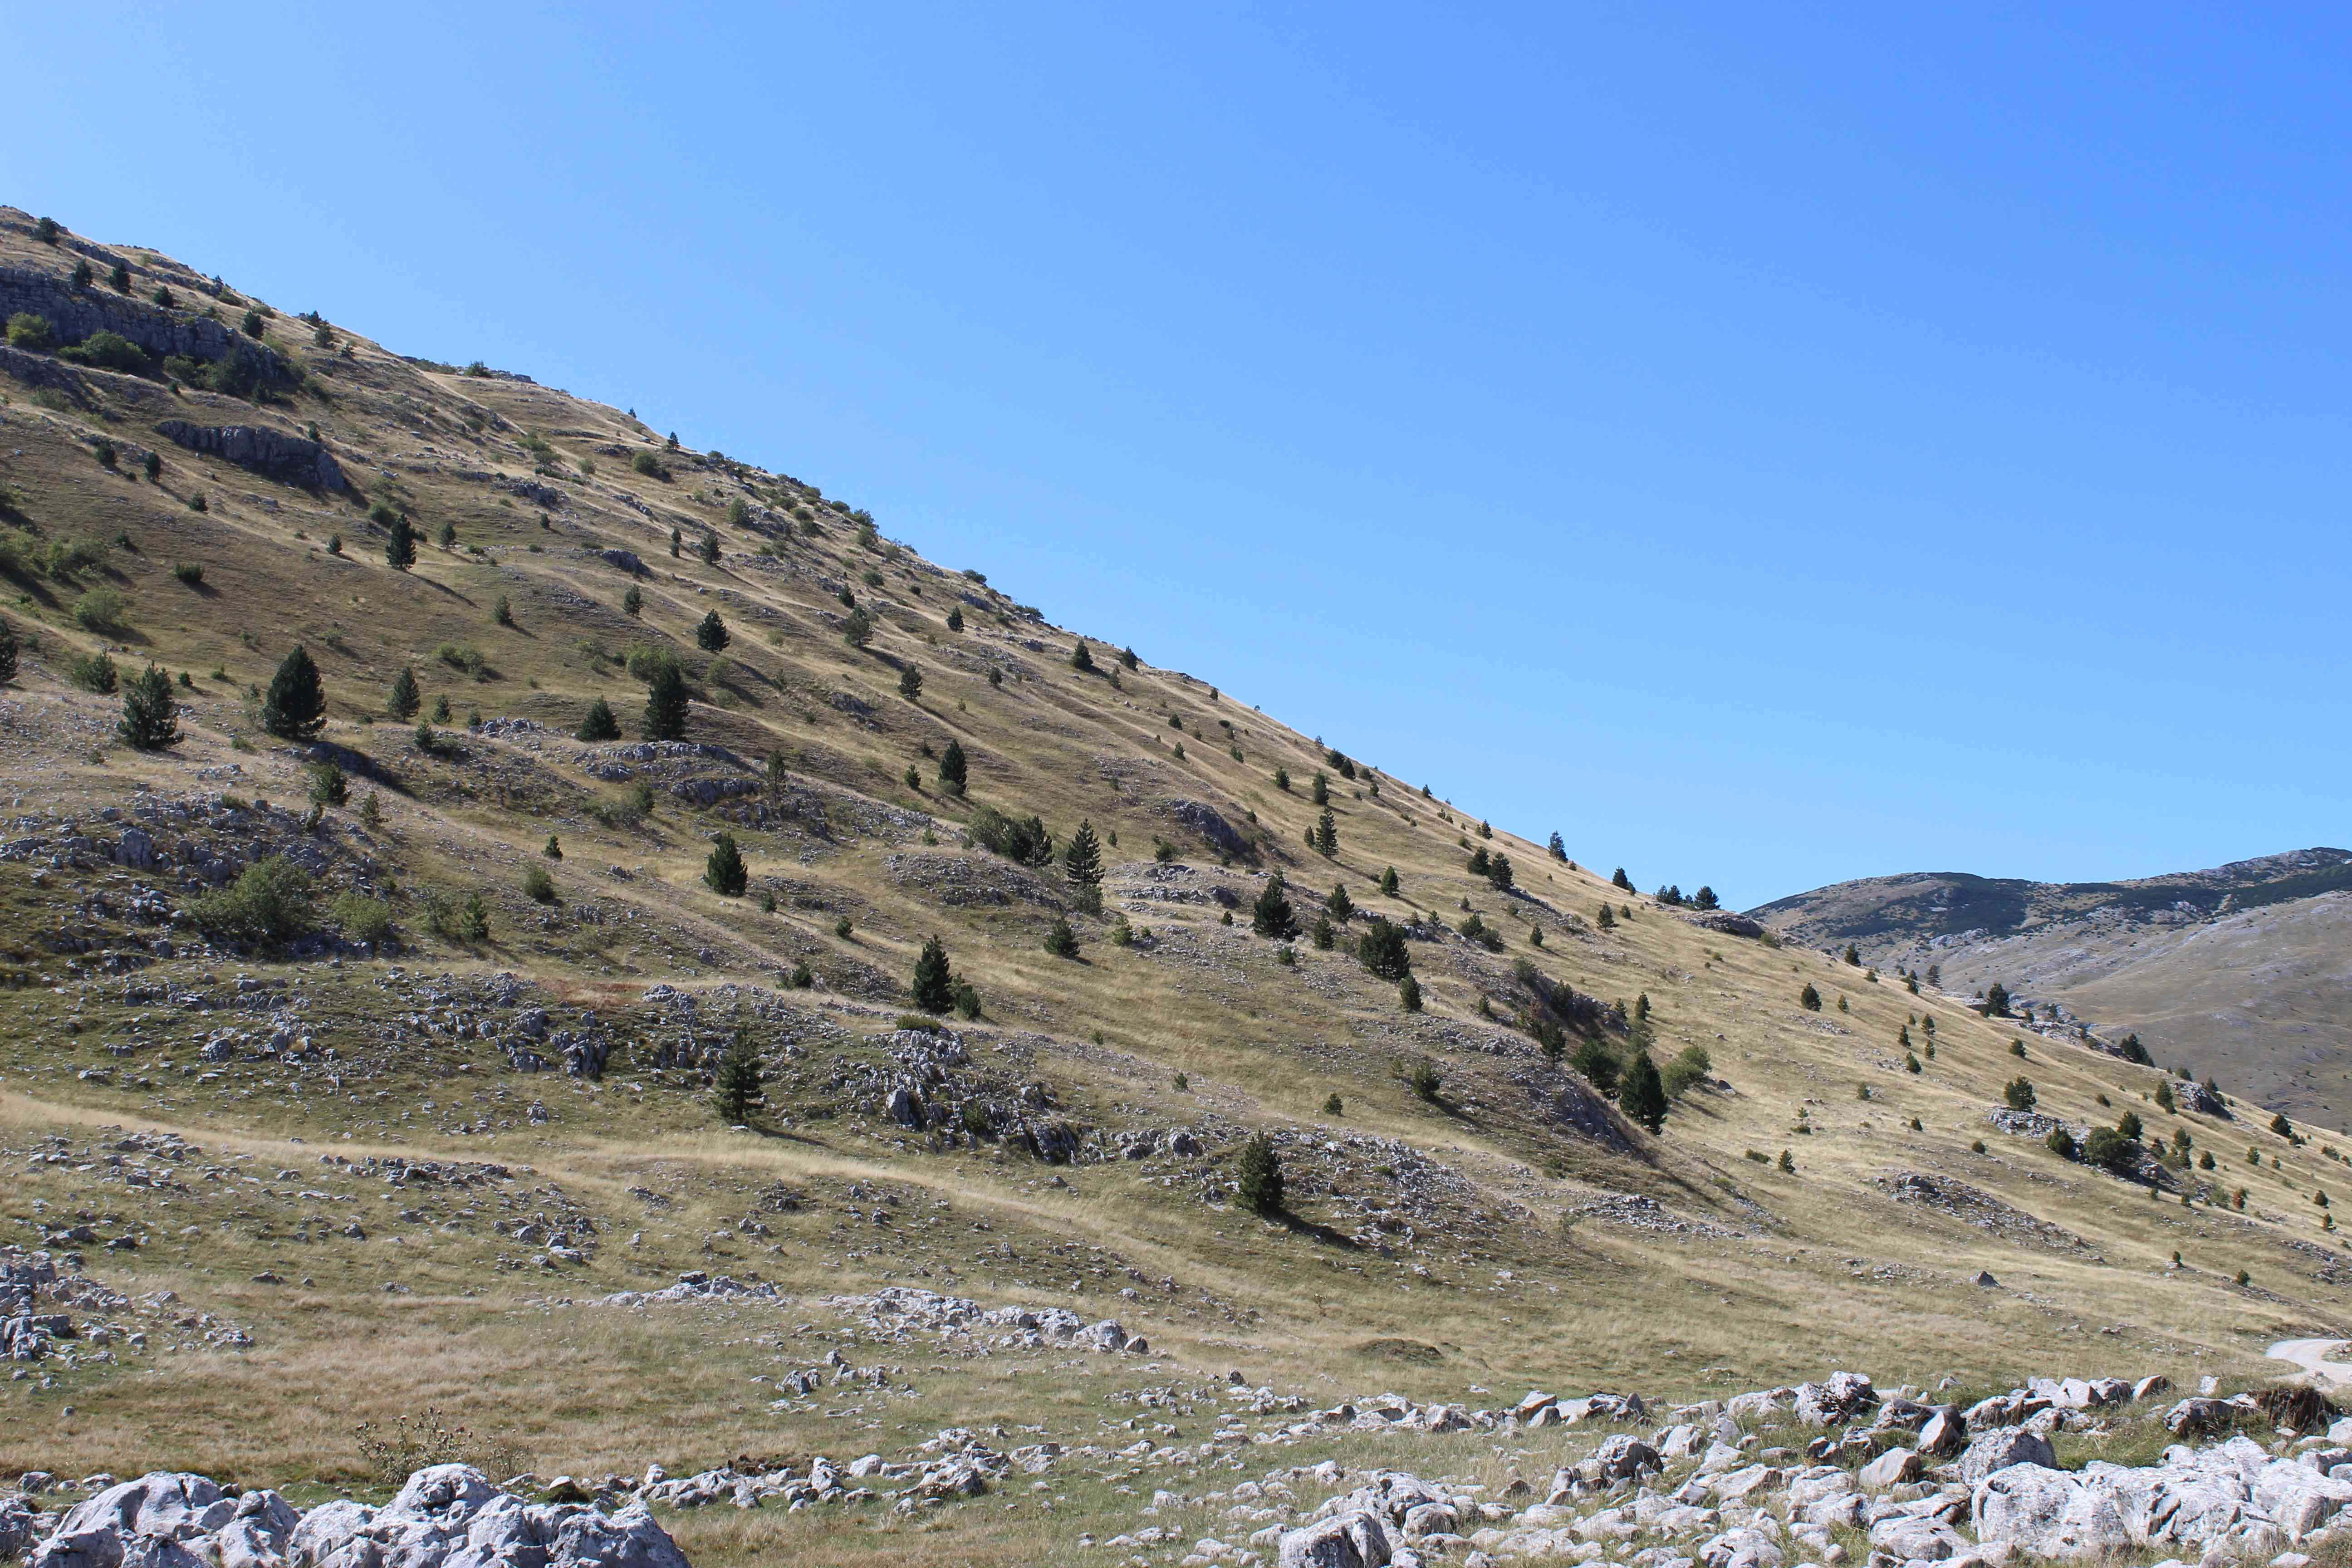 Wavy, hilly, rocky landscape of the Bosnian mountain Bjelasnica.